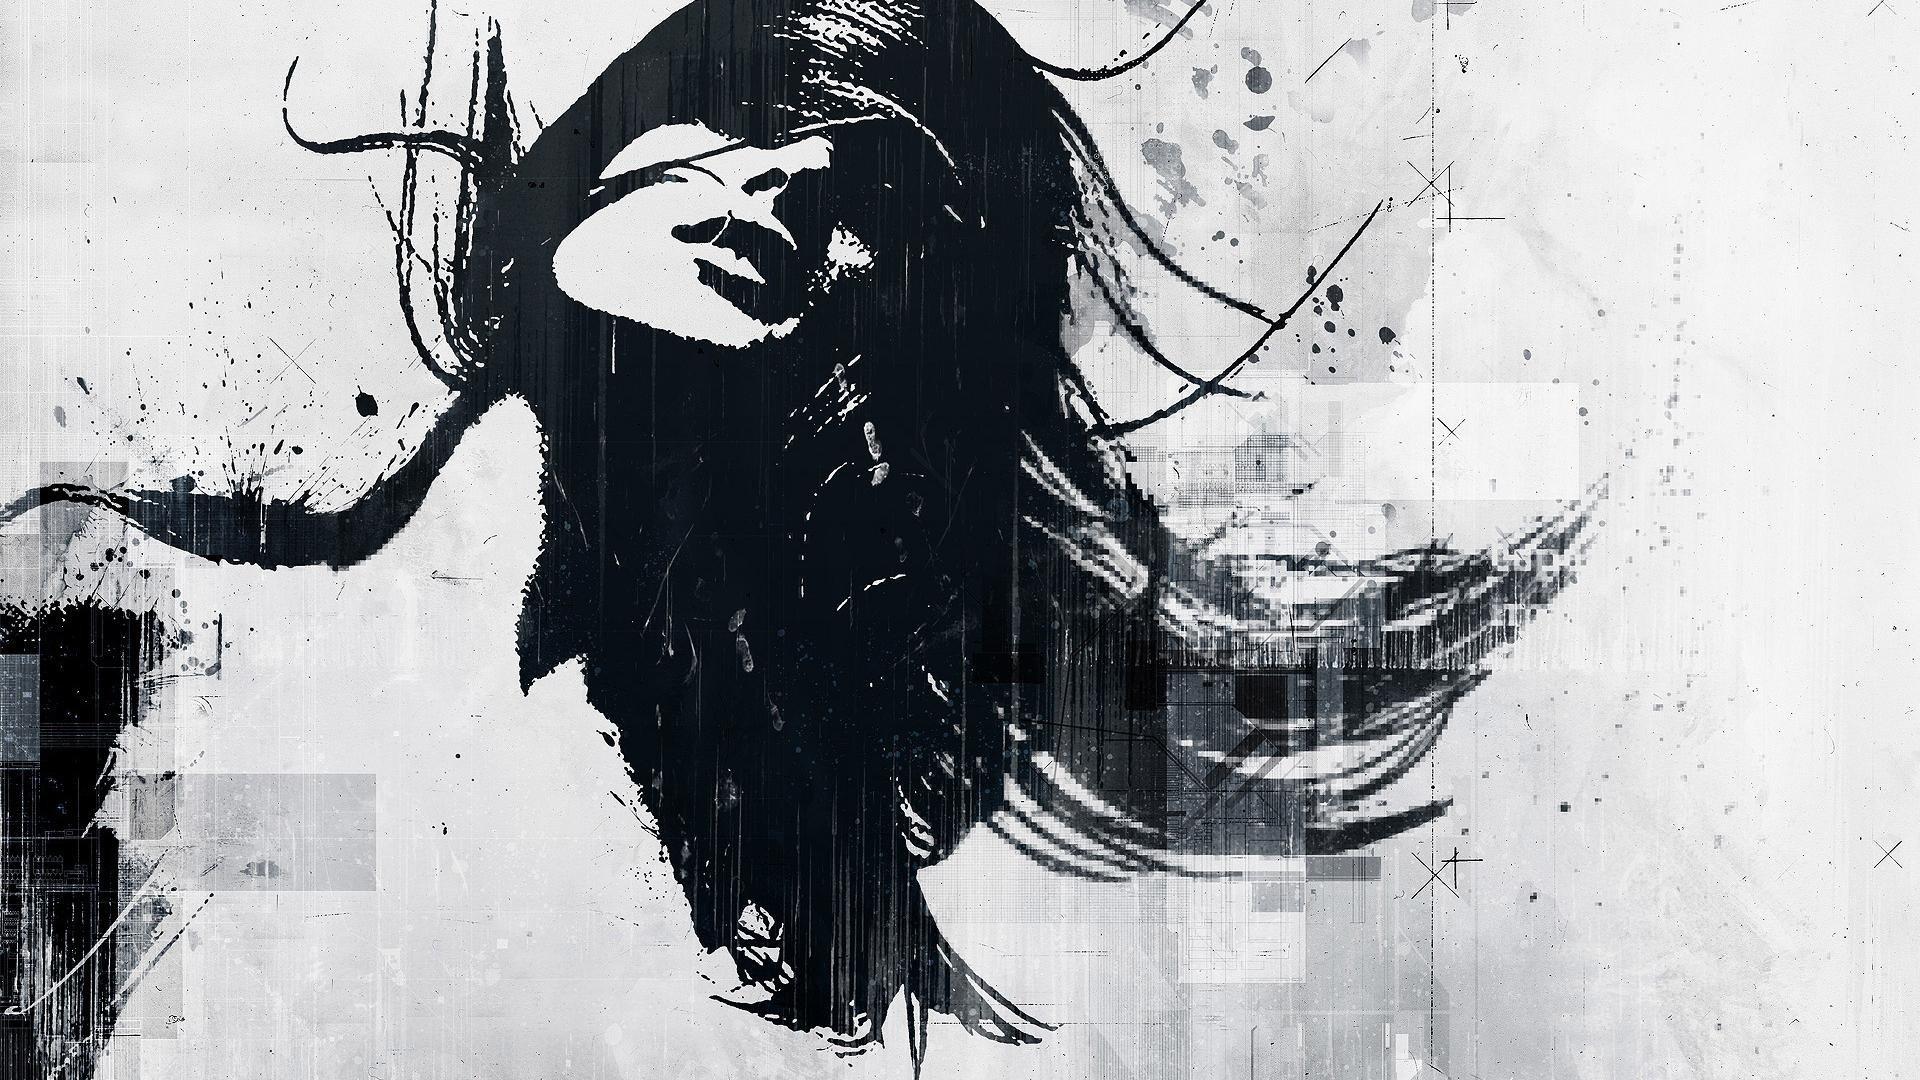 women abstract black sketches alex cherry wallpaper 1920x1080 311342 wallpaperup